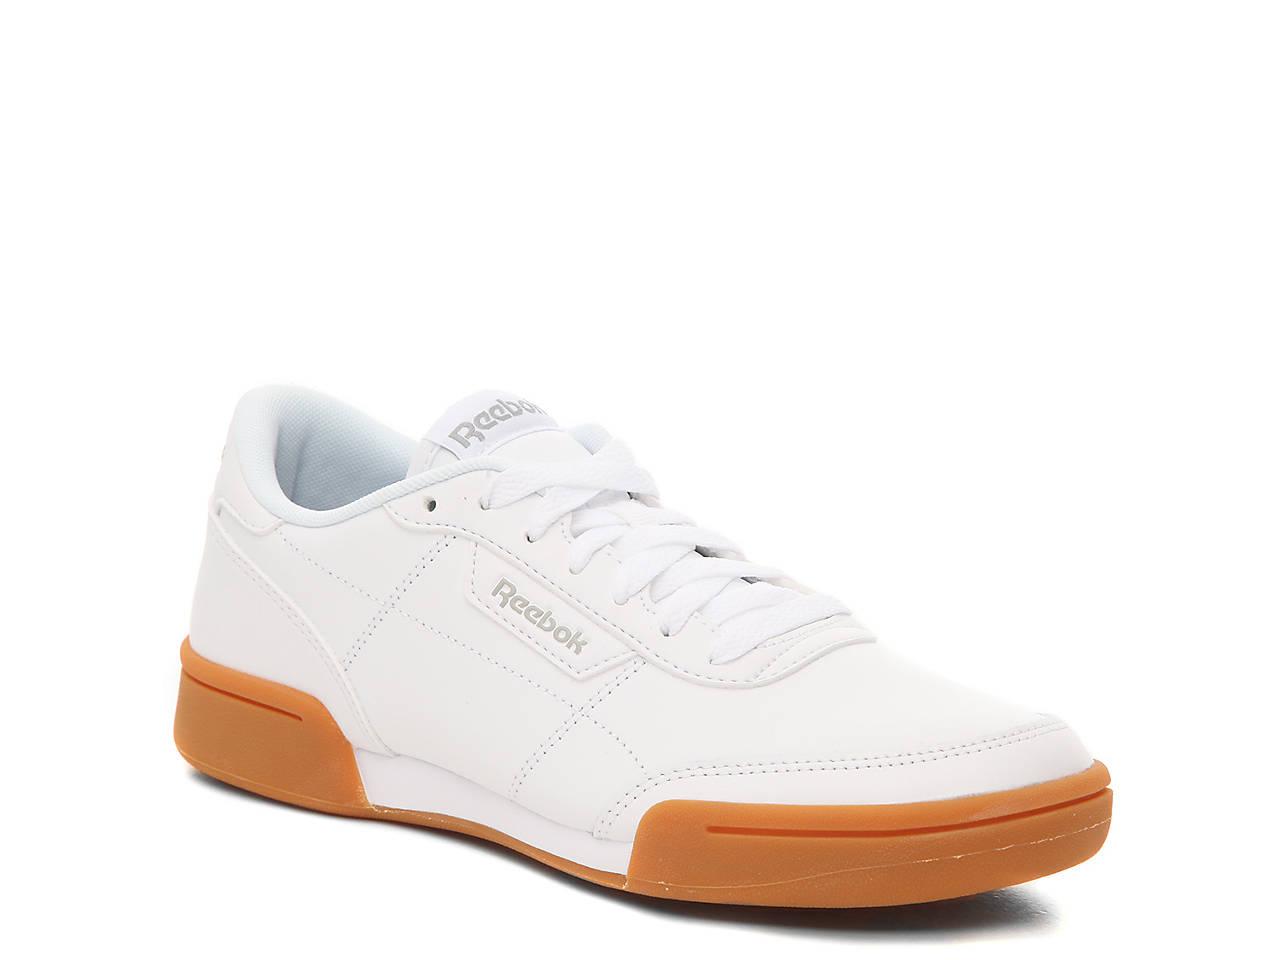 4edf1f30 Royal Heredis Sneaker - Women's